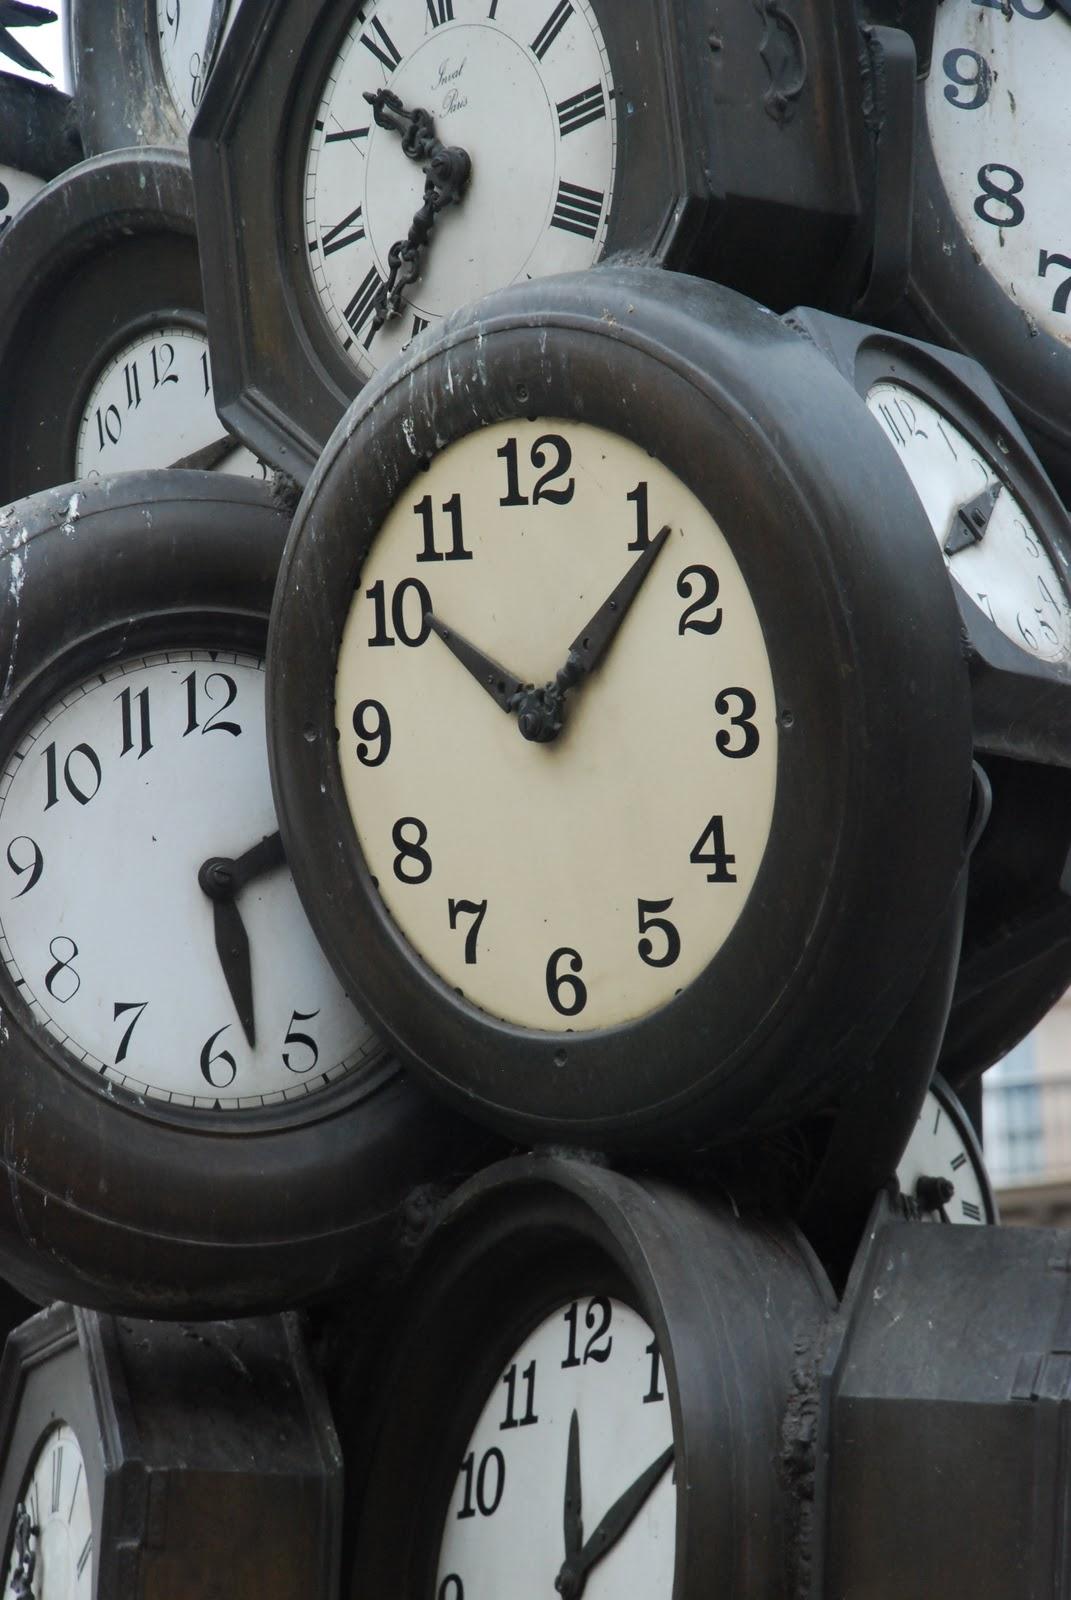 Clocks at Gare St Lazare railway station, Paris.